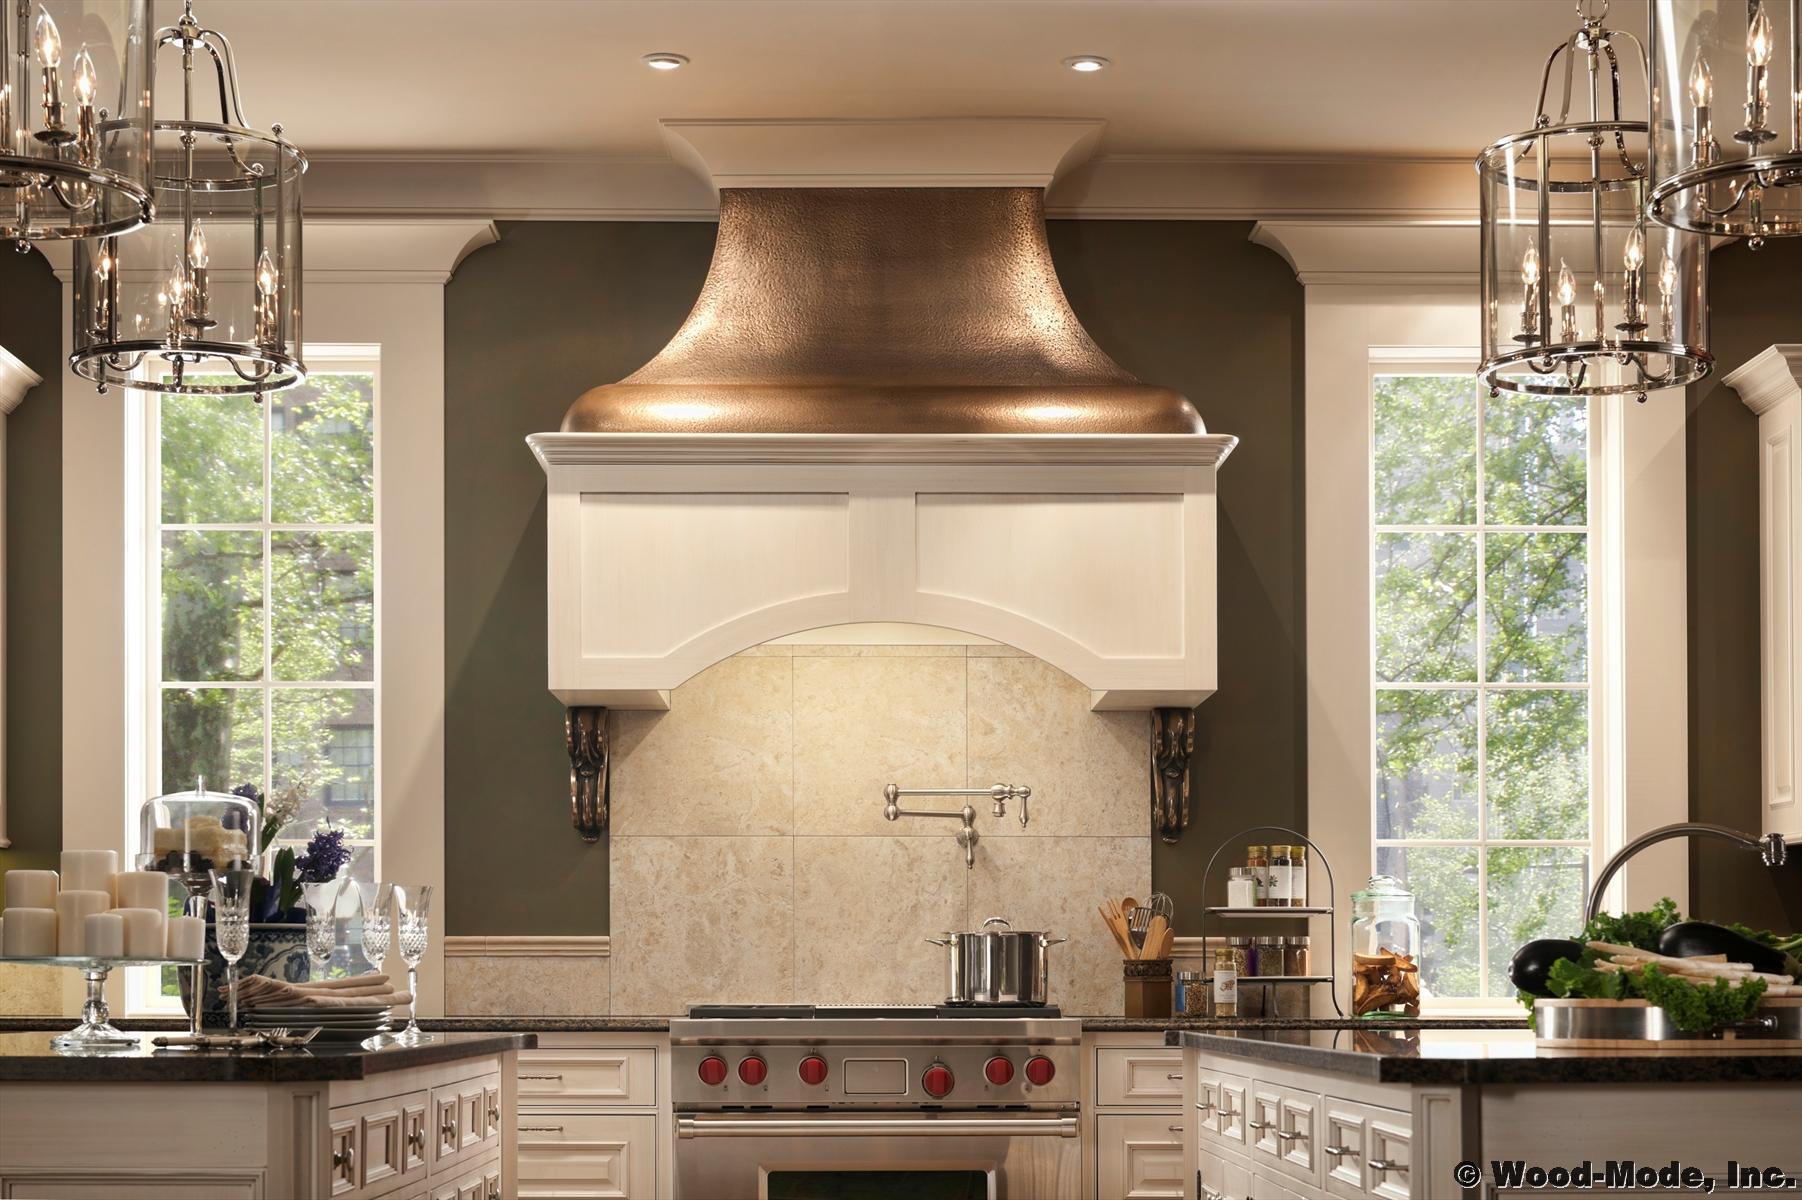 Interior Design Vs Kitchen Design What S The Difference